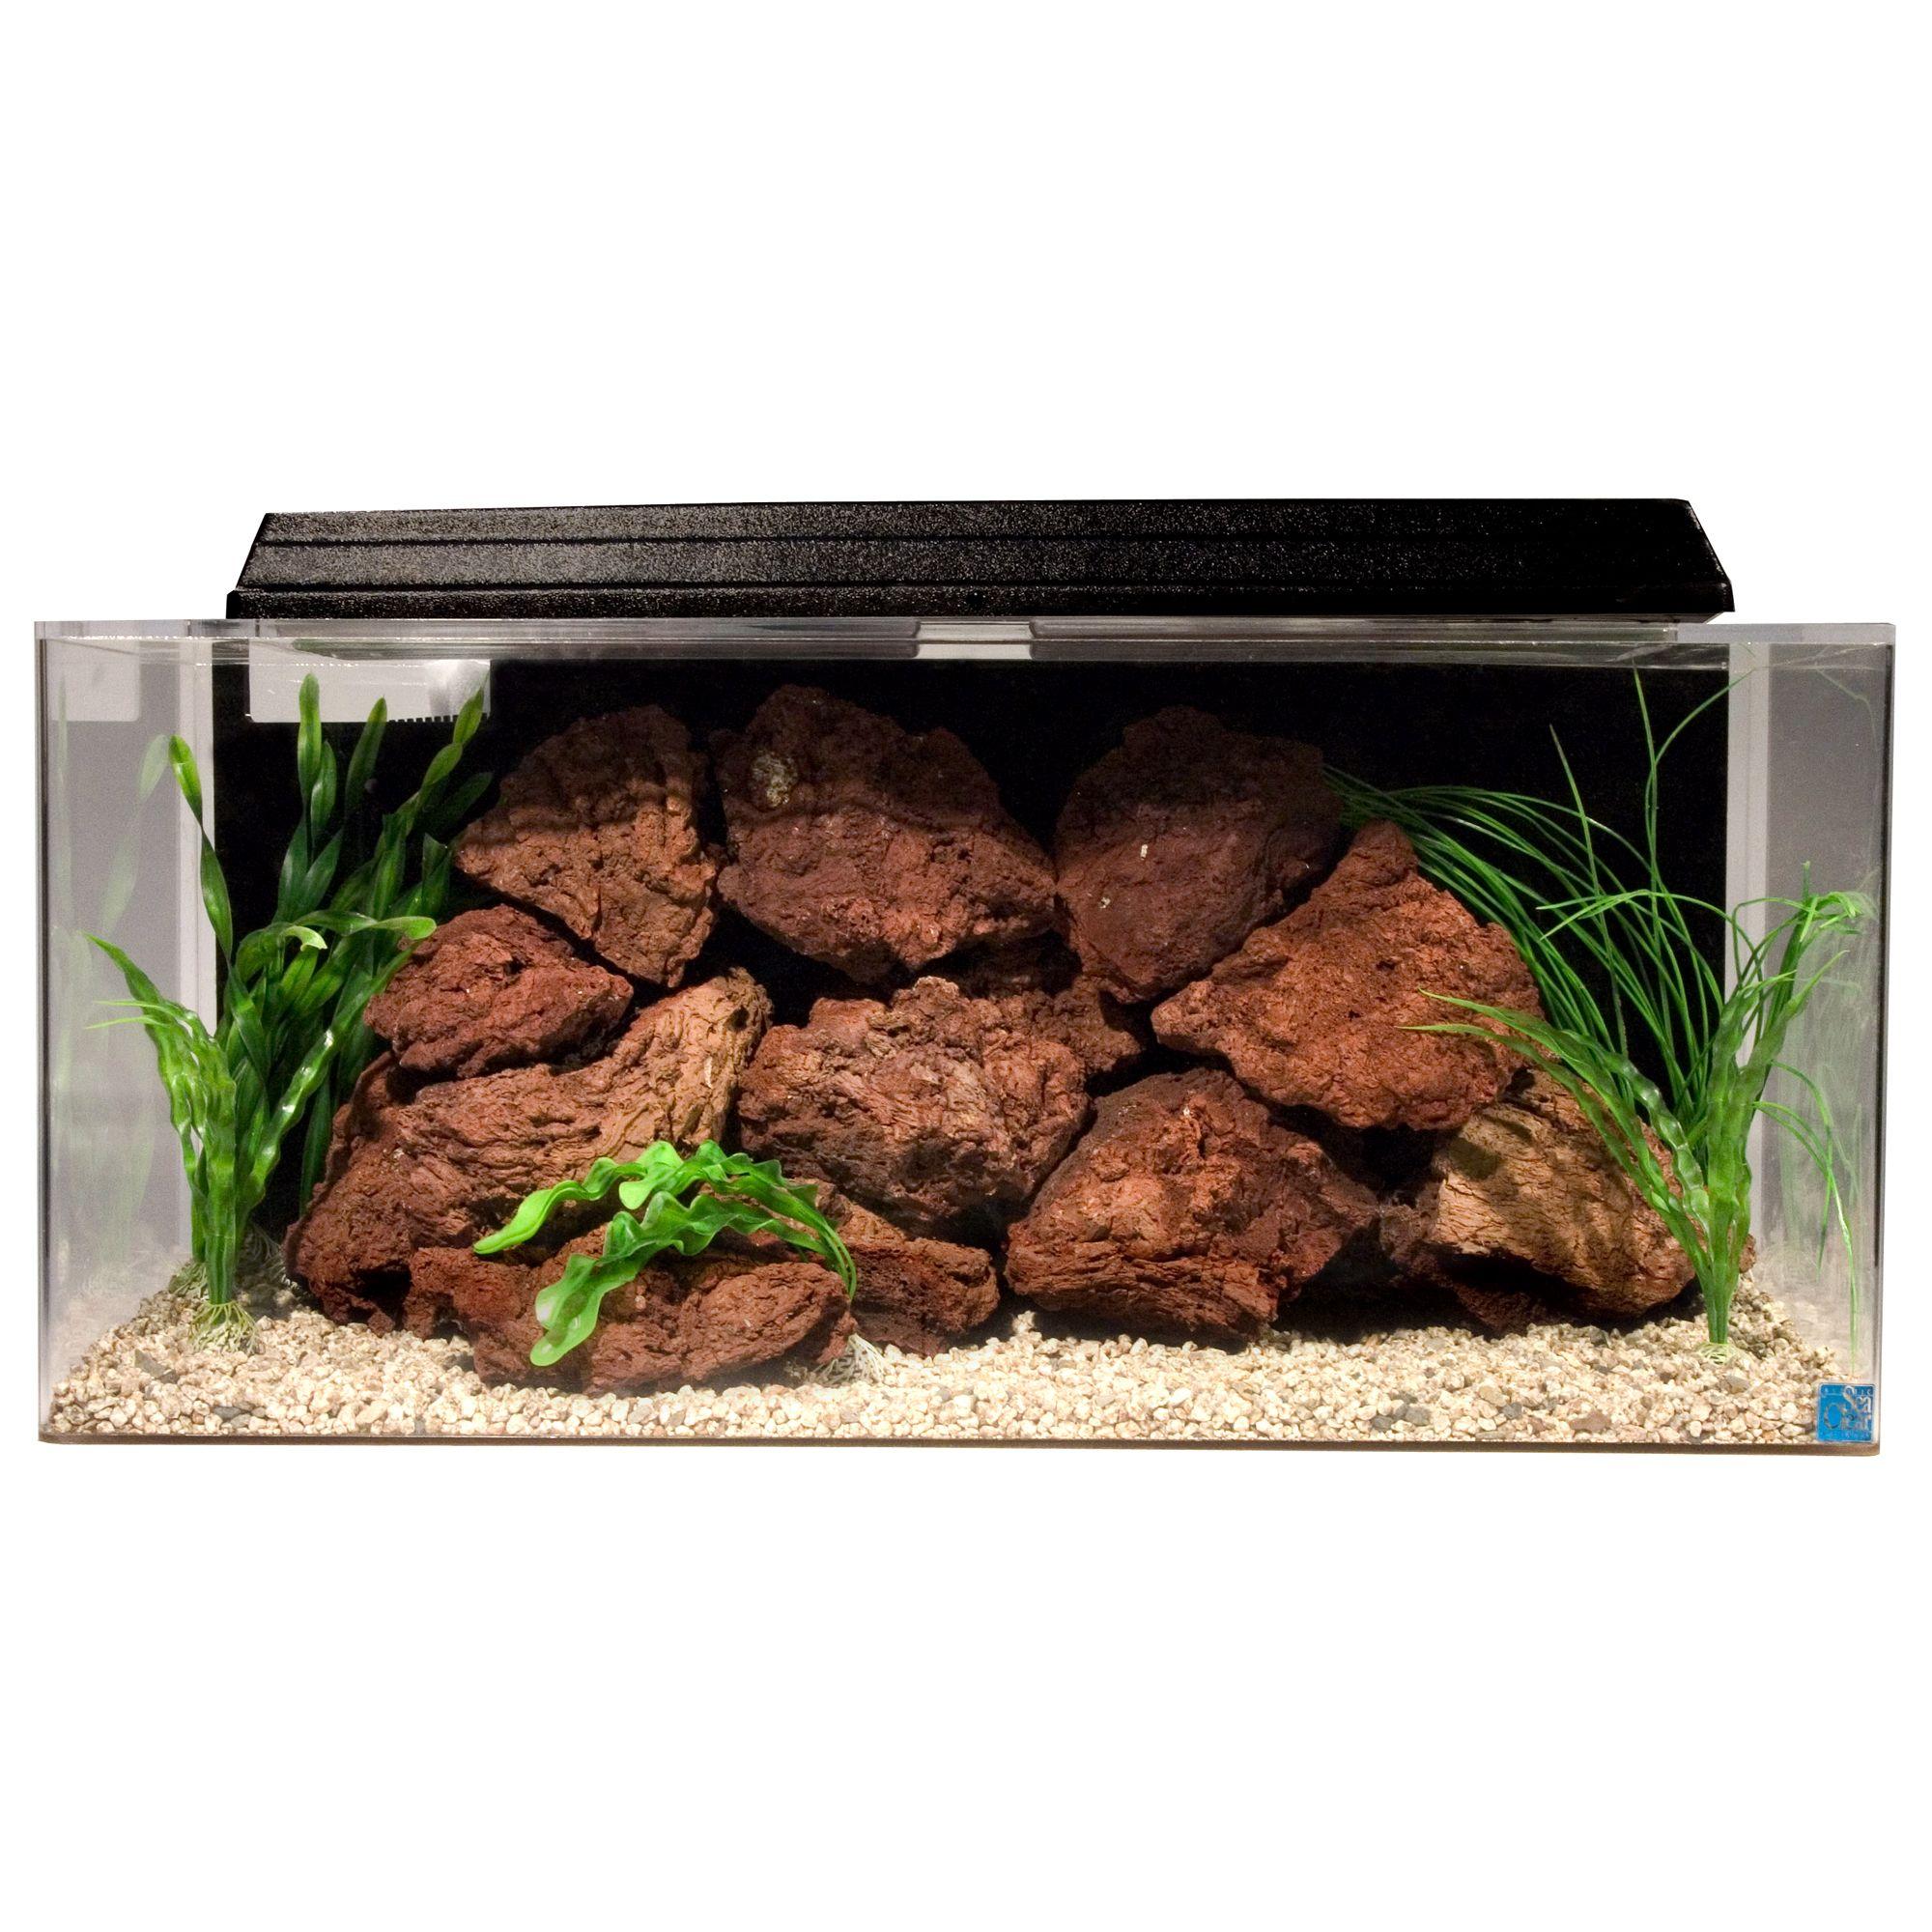 Seaclear 30 Gallon System Ii Rectangle Aquarium Size 30 Gal Black